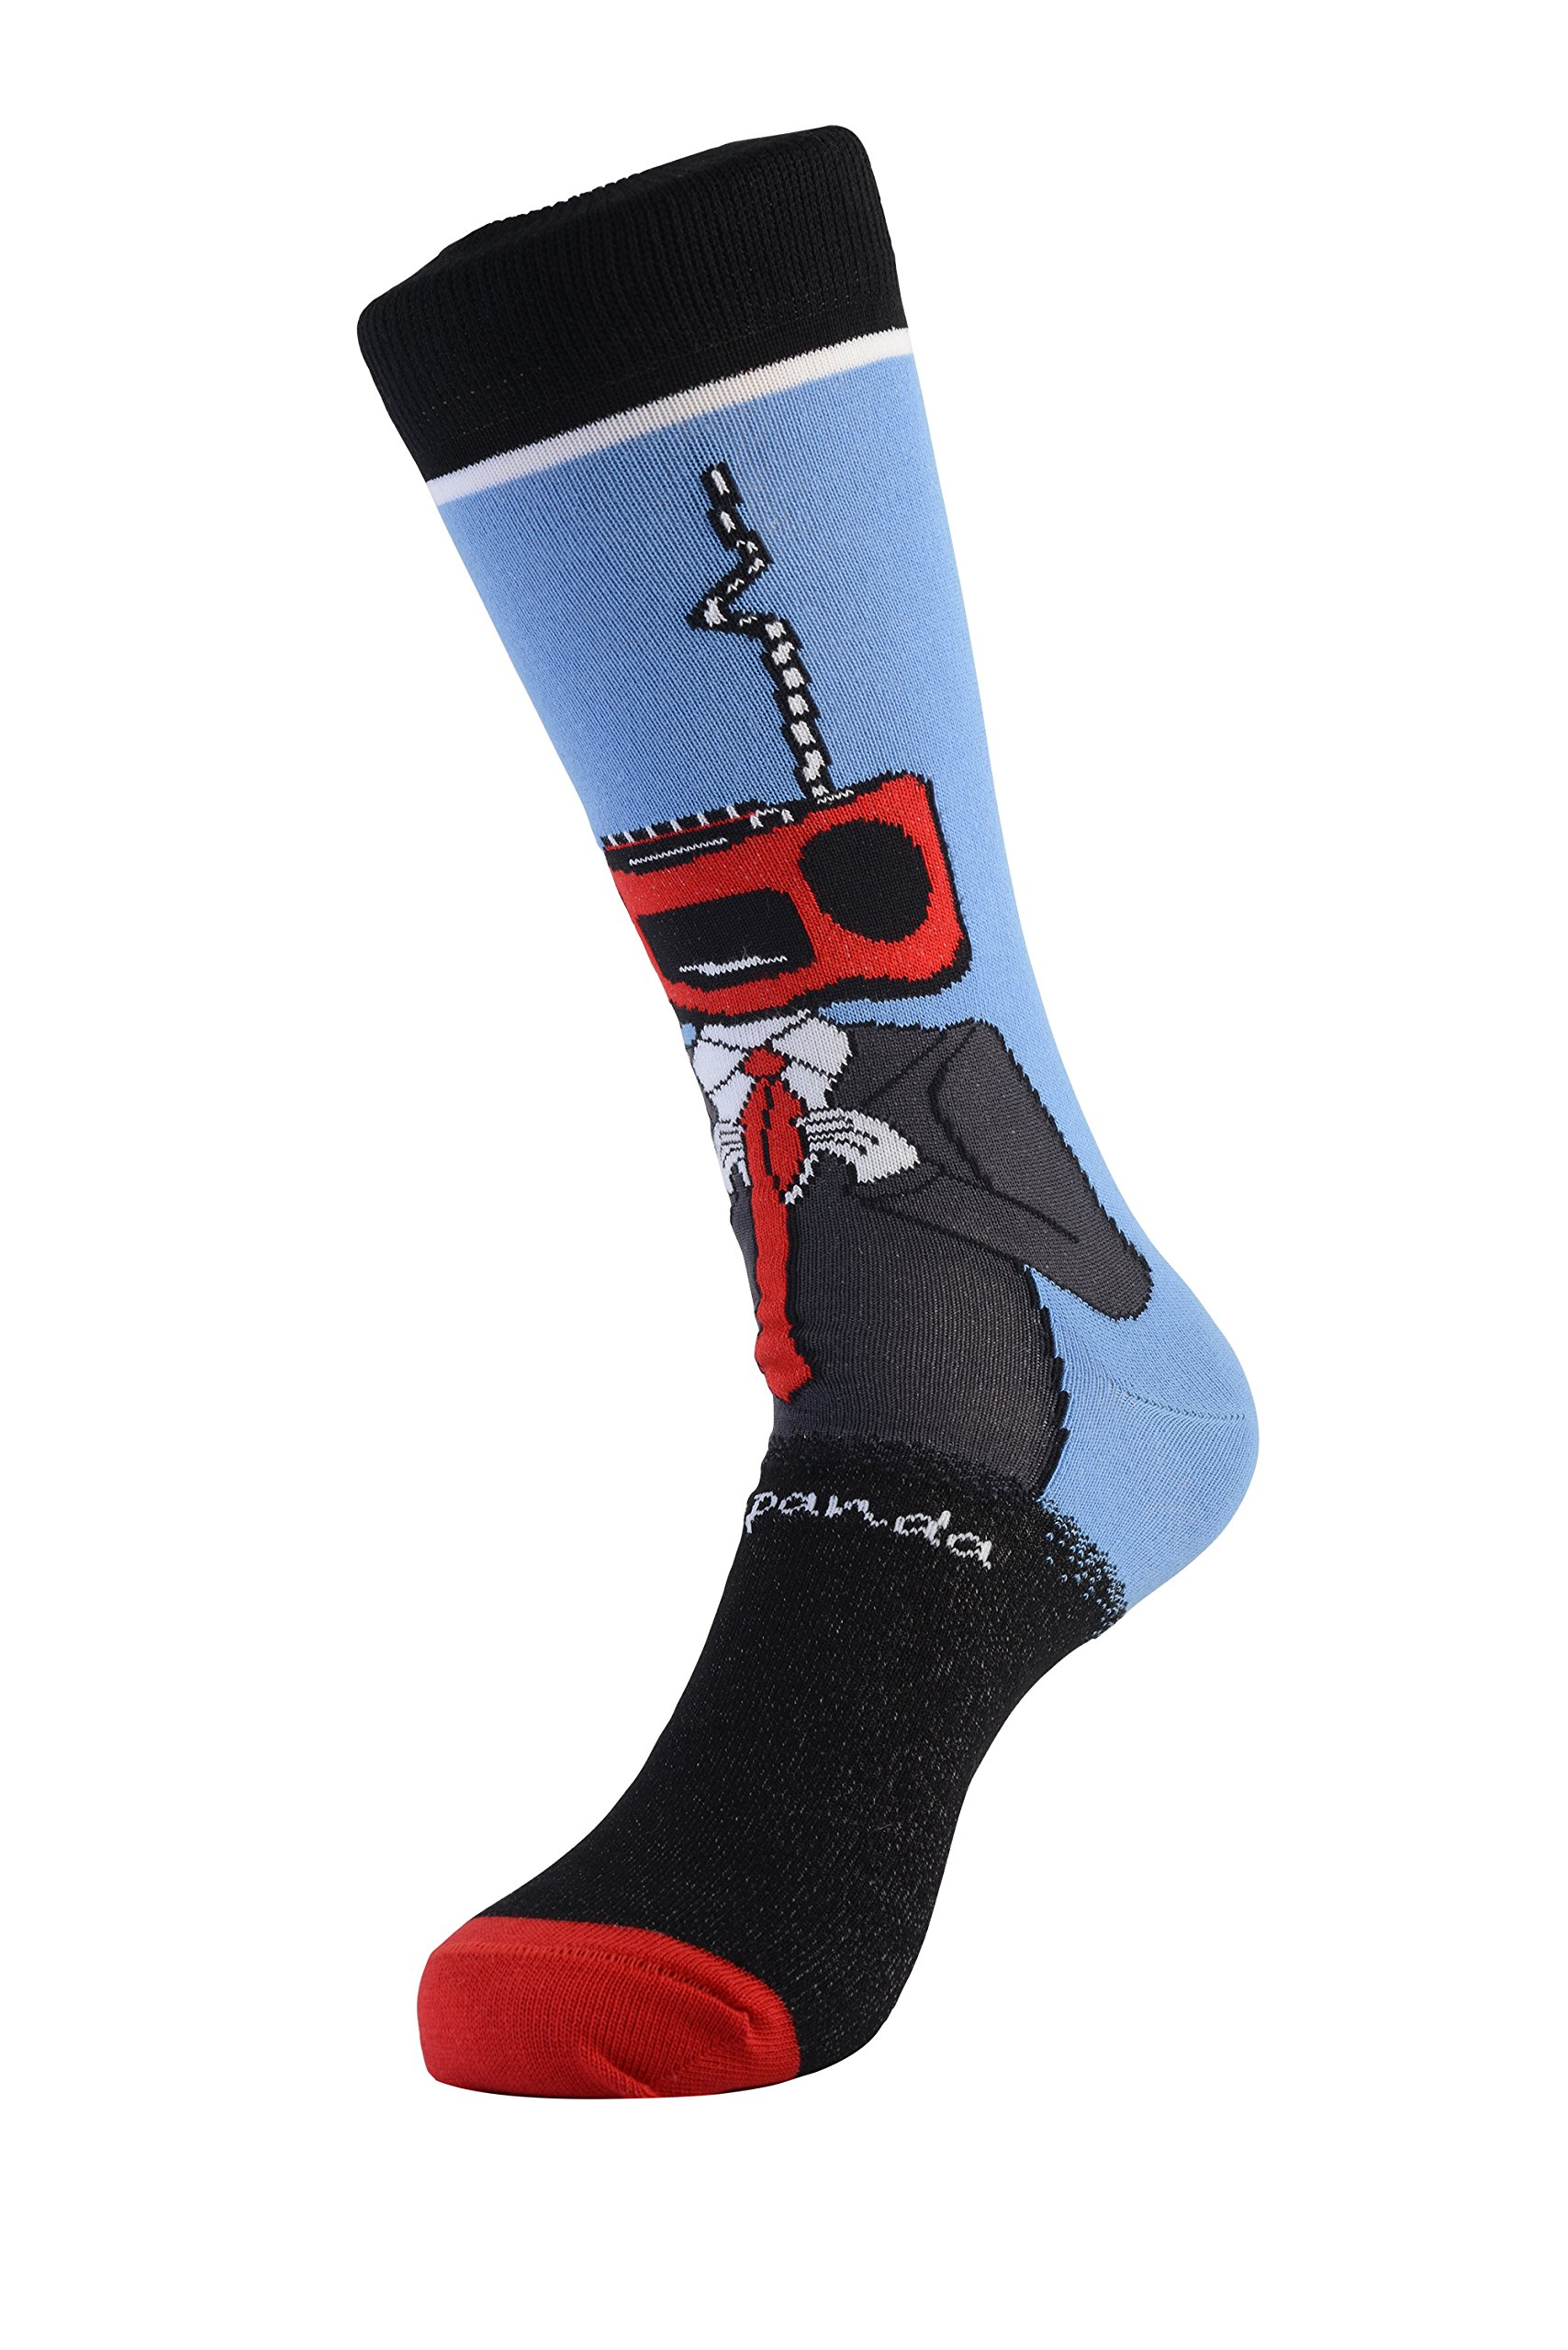 Radio Head Socks from the Sock Panda